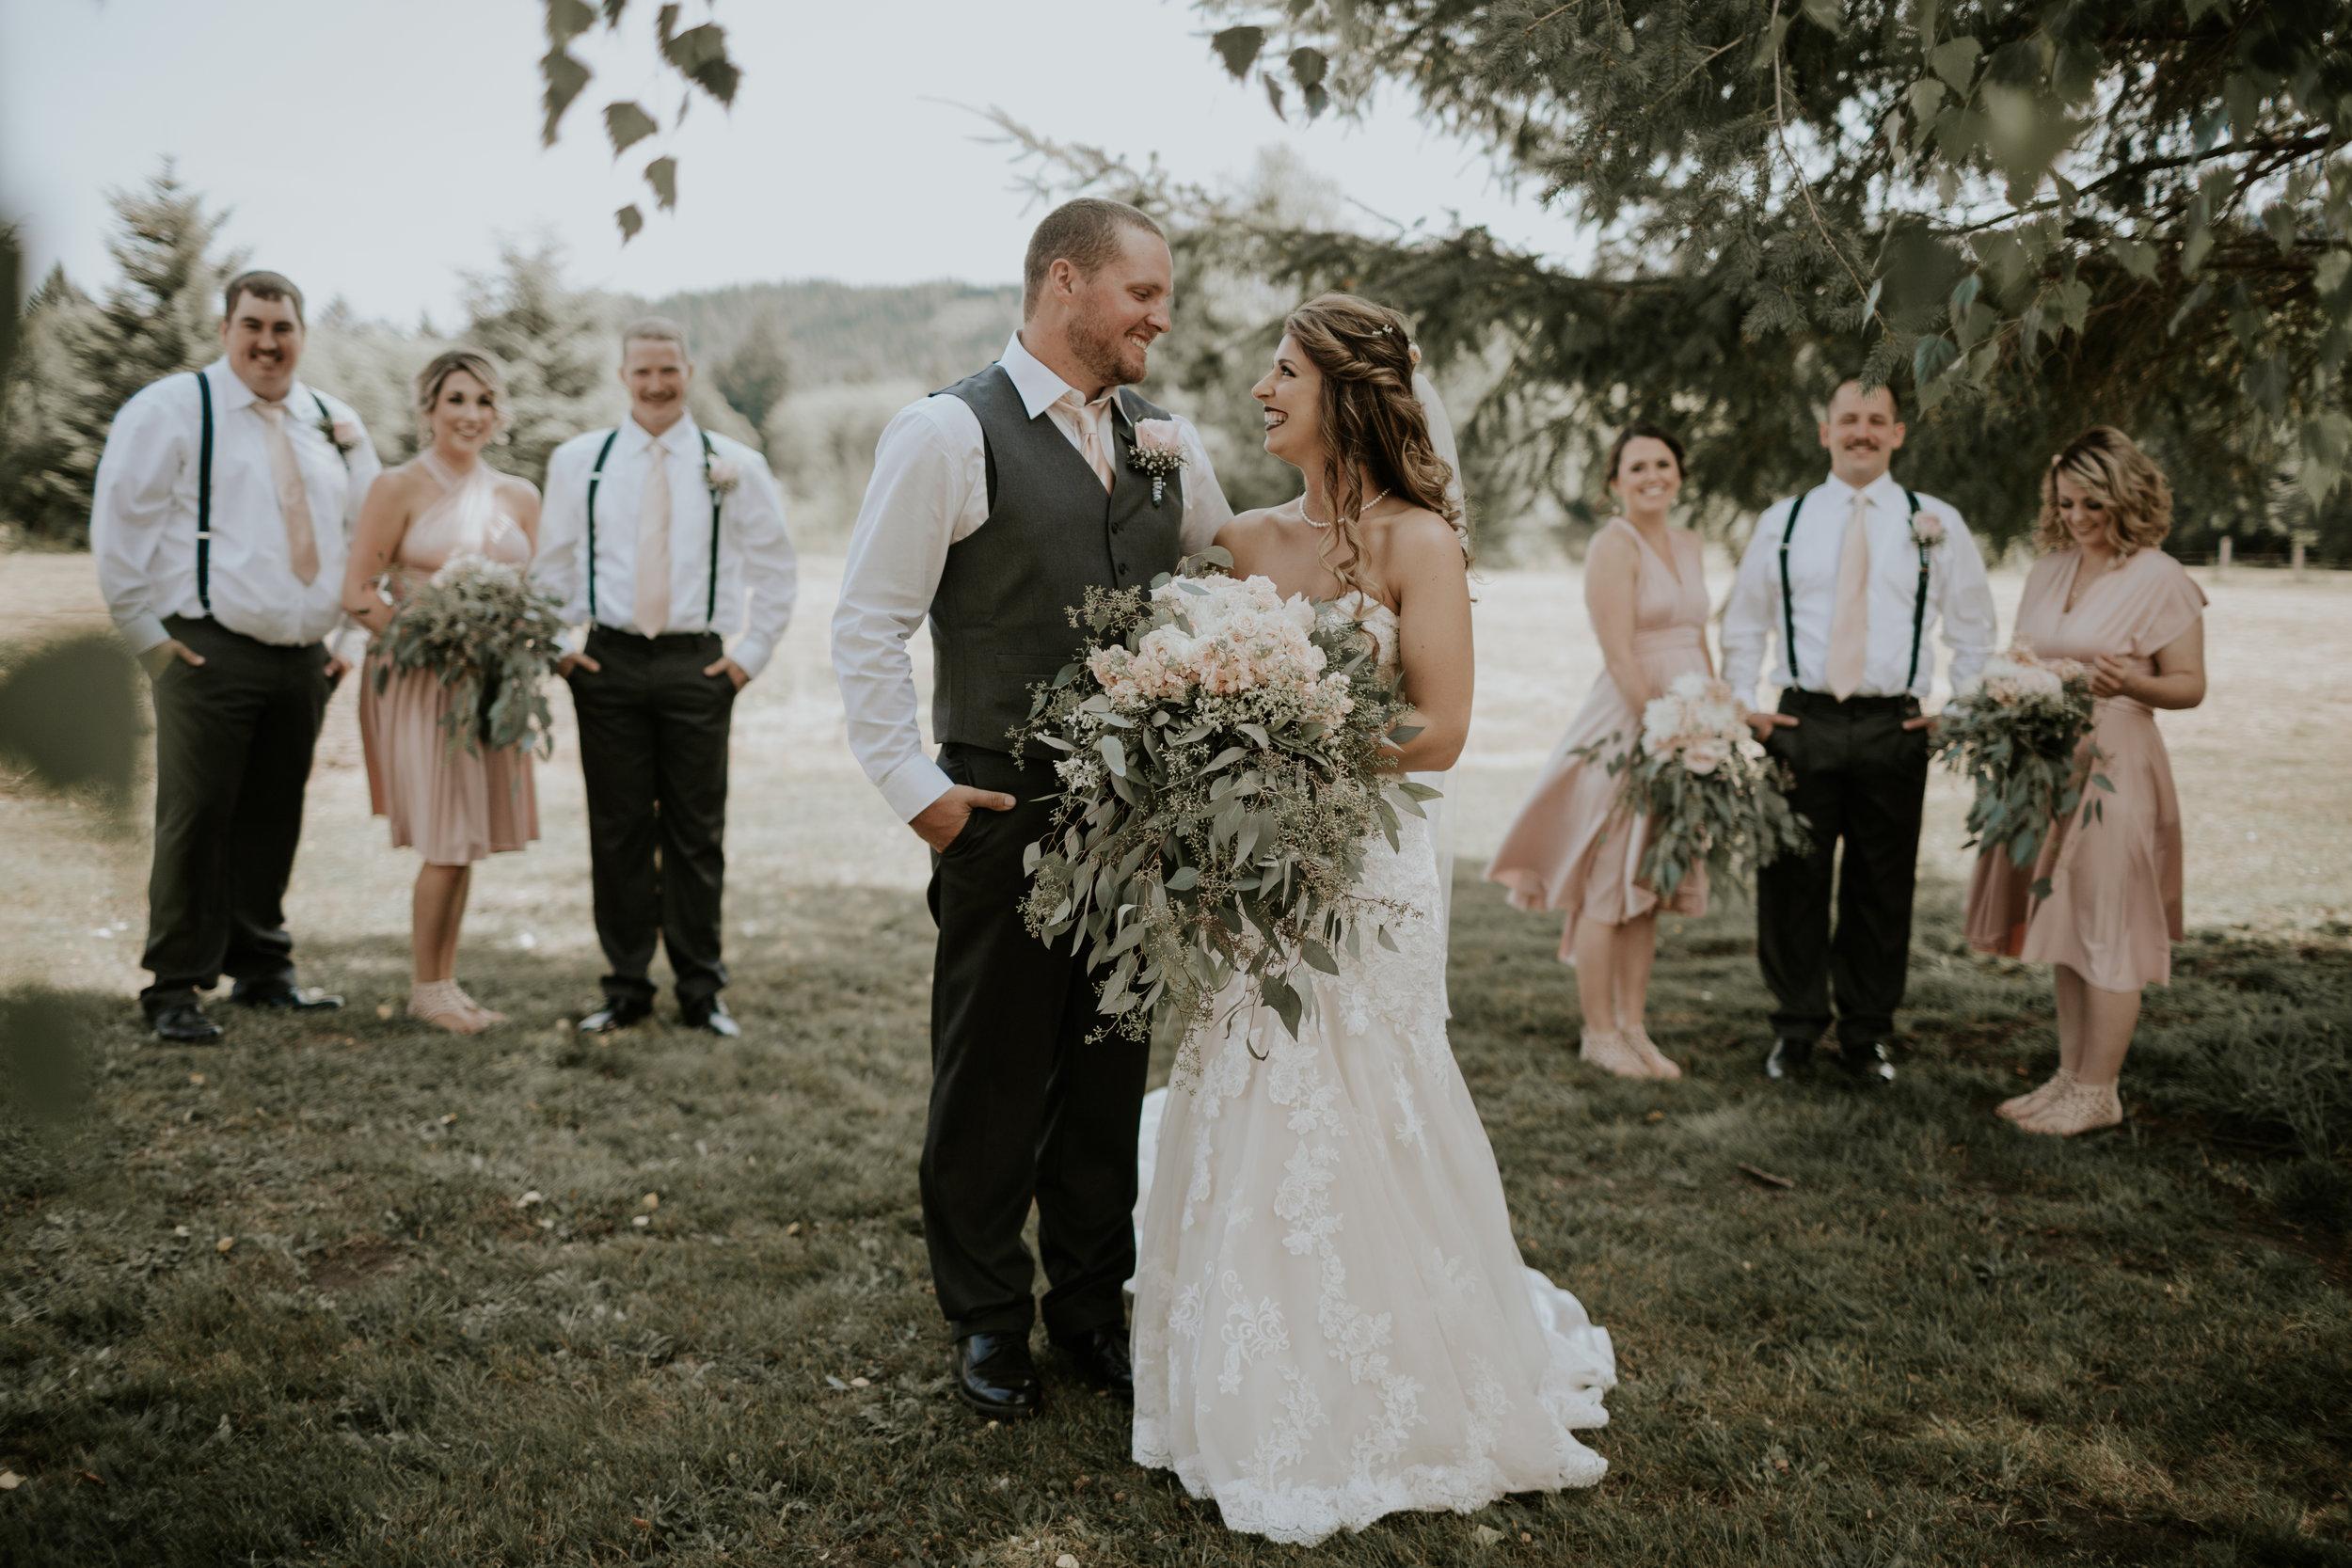 Olympic-Peninsula-Wedding-Photographer-PNW-Forks-Port-Angeles-Kayla-Dawn-Photography-engagement-Olympic-National-Park-15.jpg